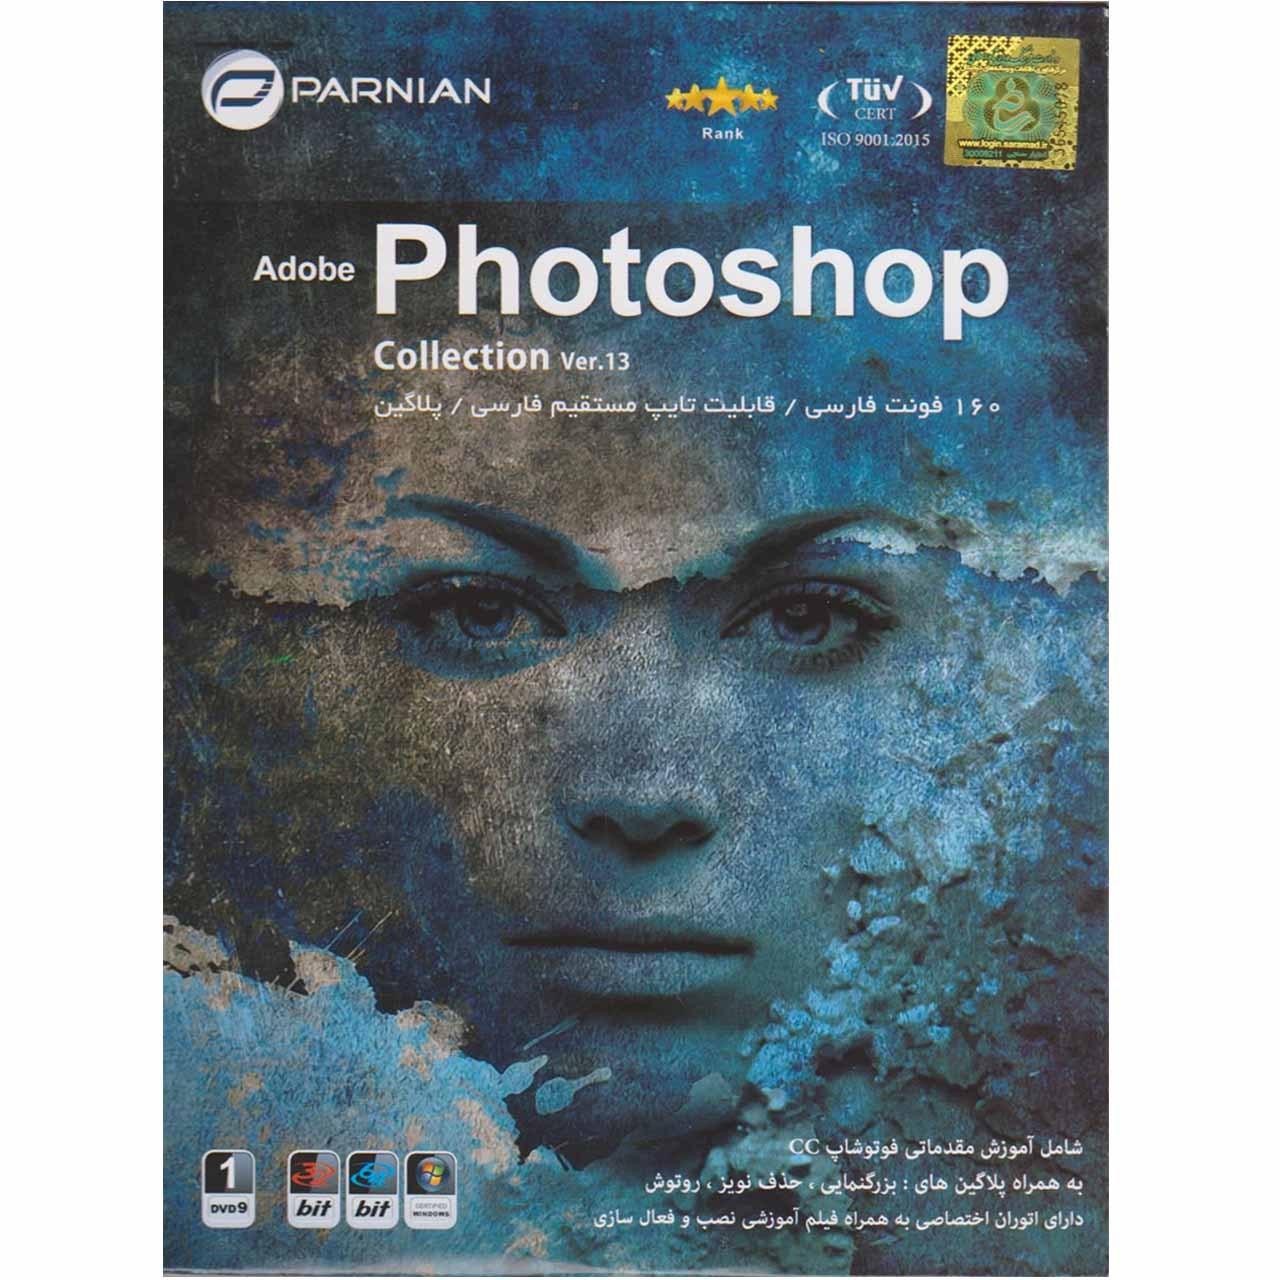 نرم افزار Adobe Photoshop Collection ver.13  نشر پرنیان